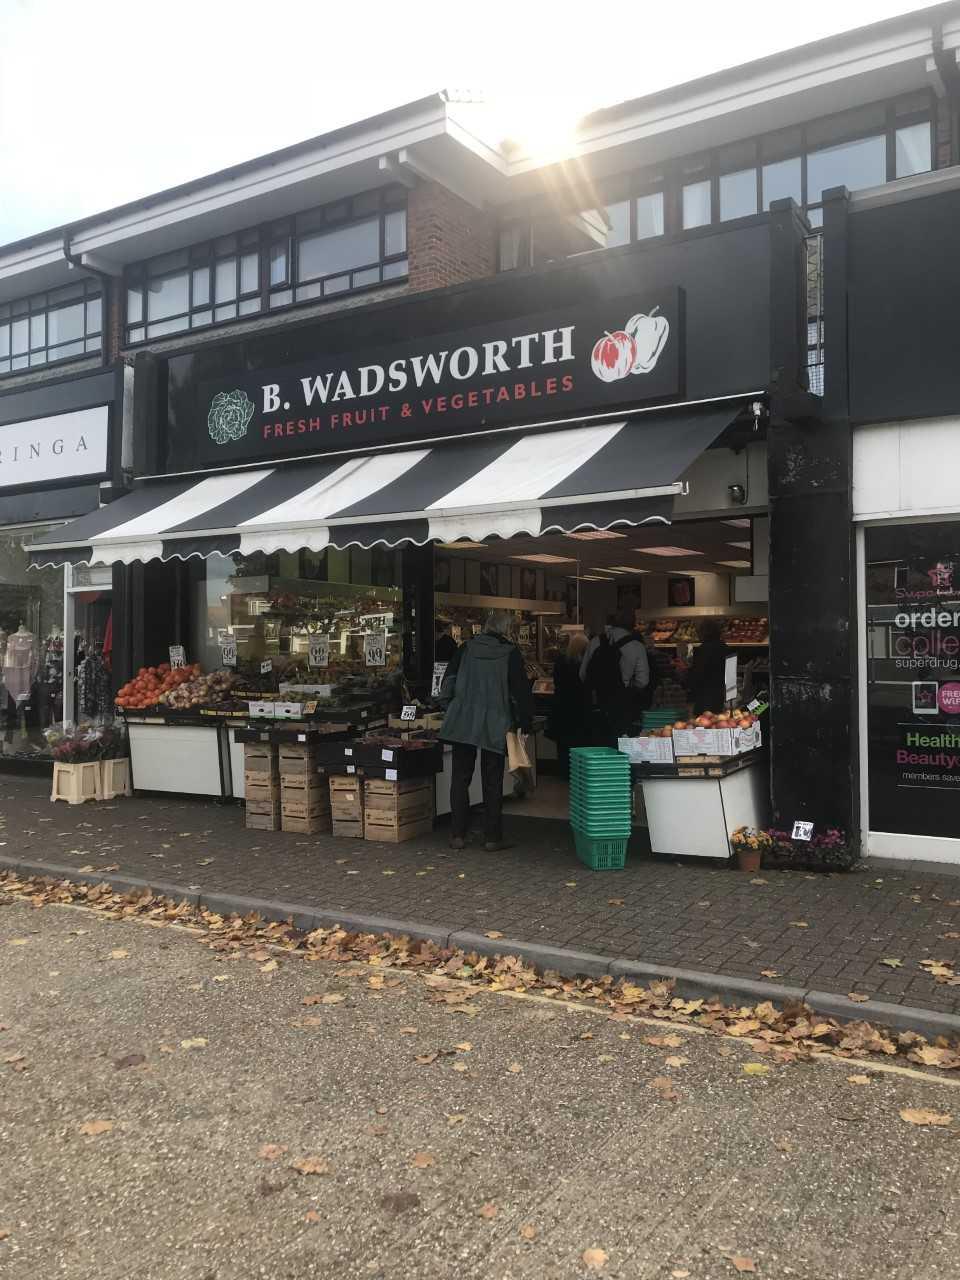 B. Wadsworth in Rustington (1)